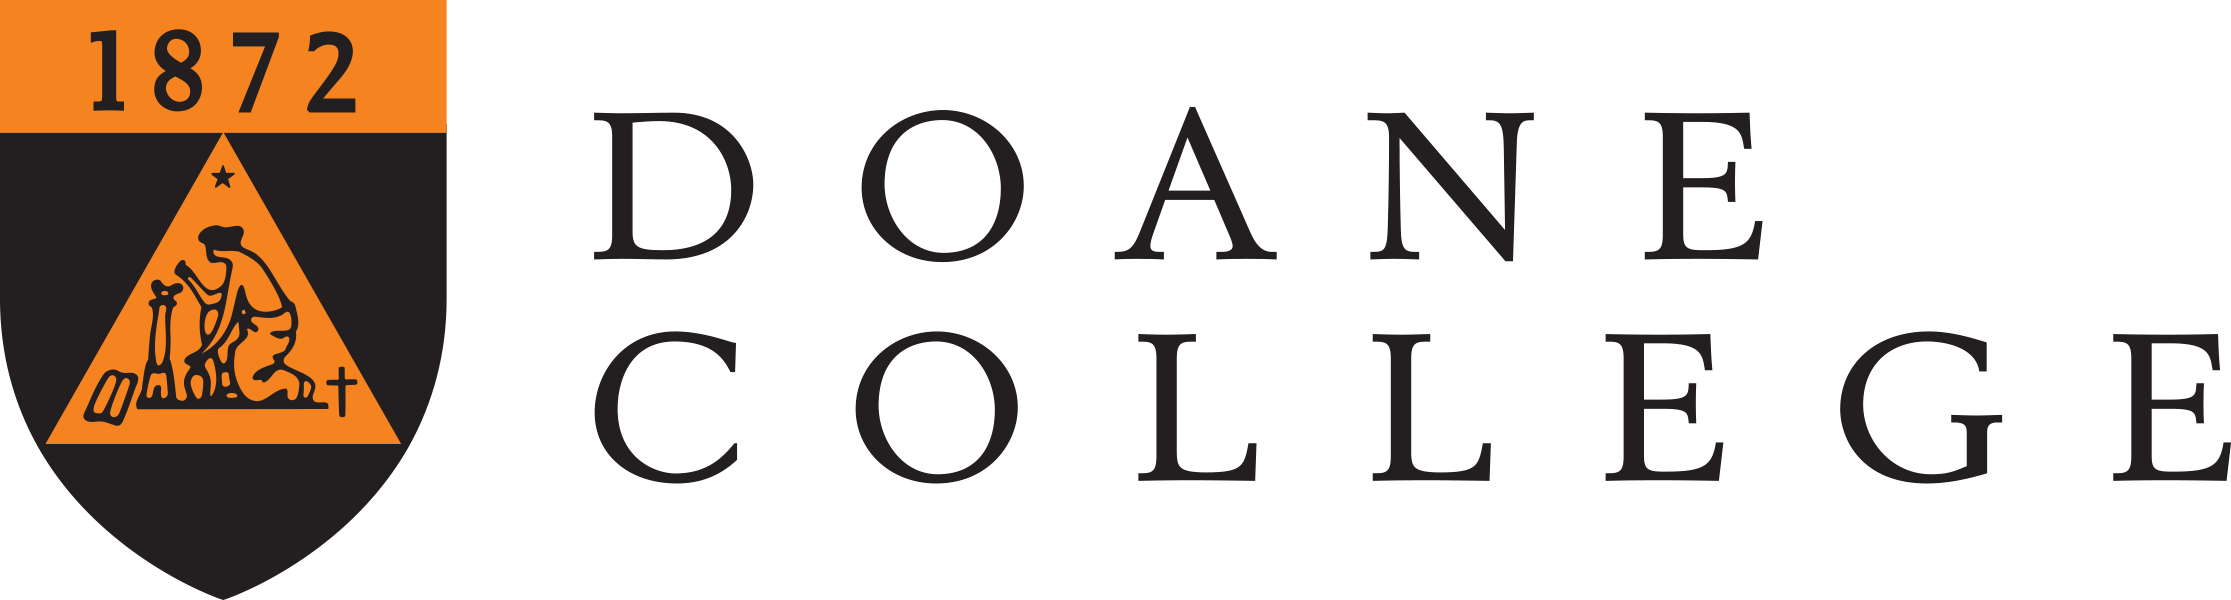 doane-college-logo-orange.png